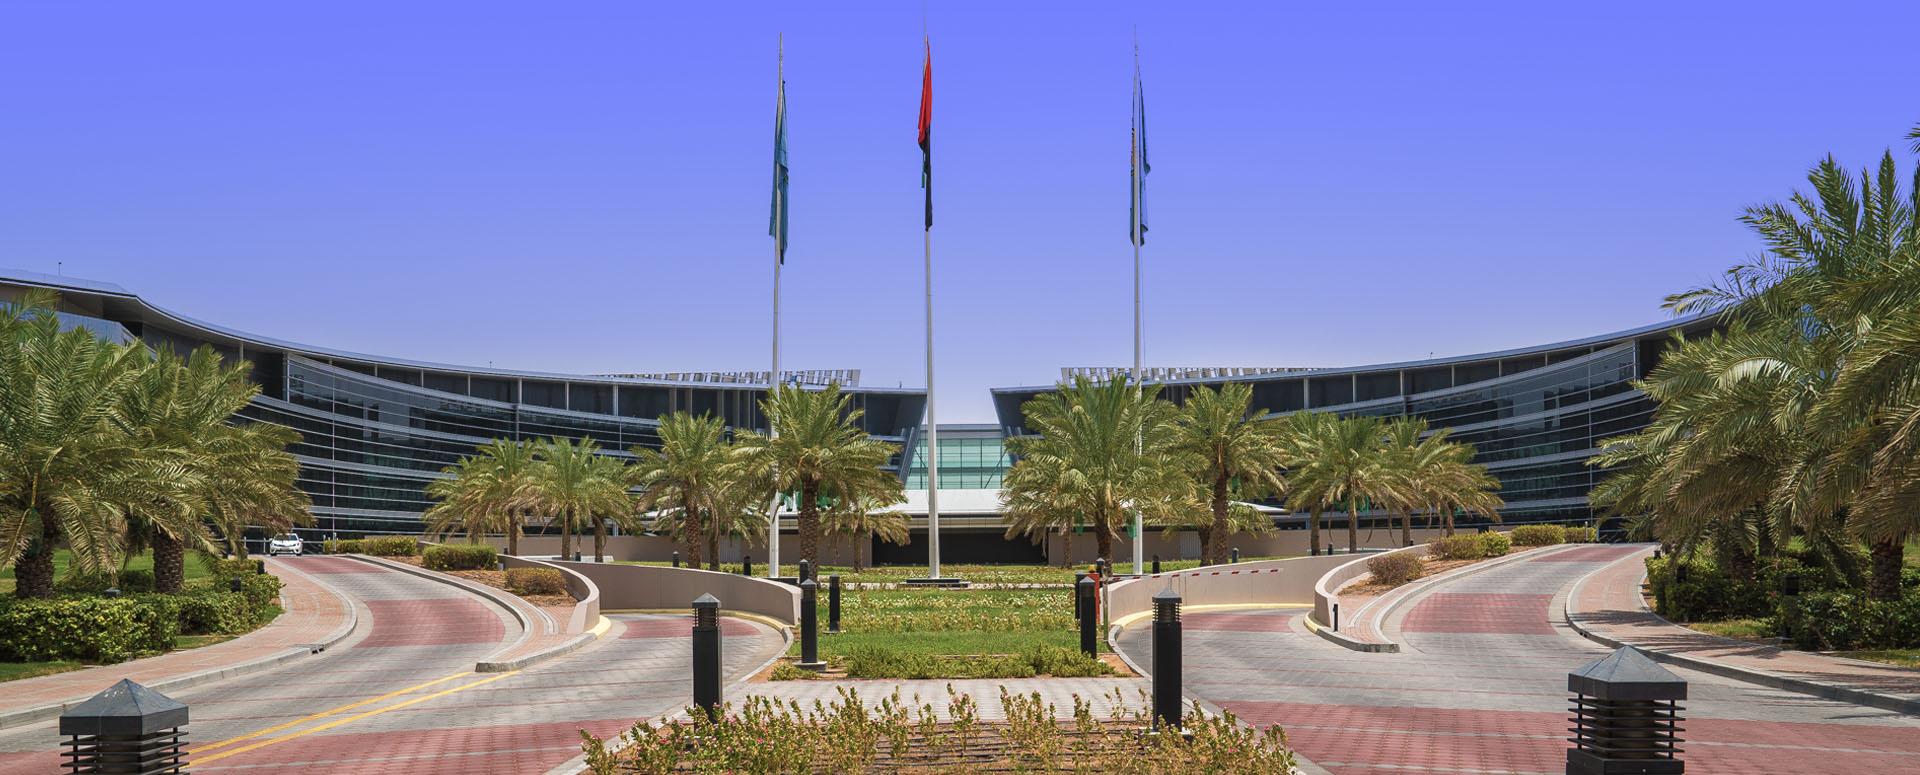 United Arab Emirates University Food And Agriculture Ednet Ae